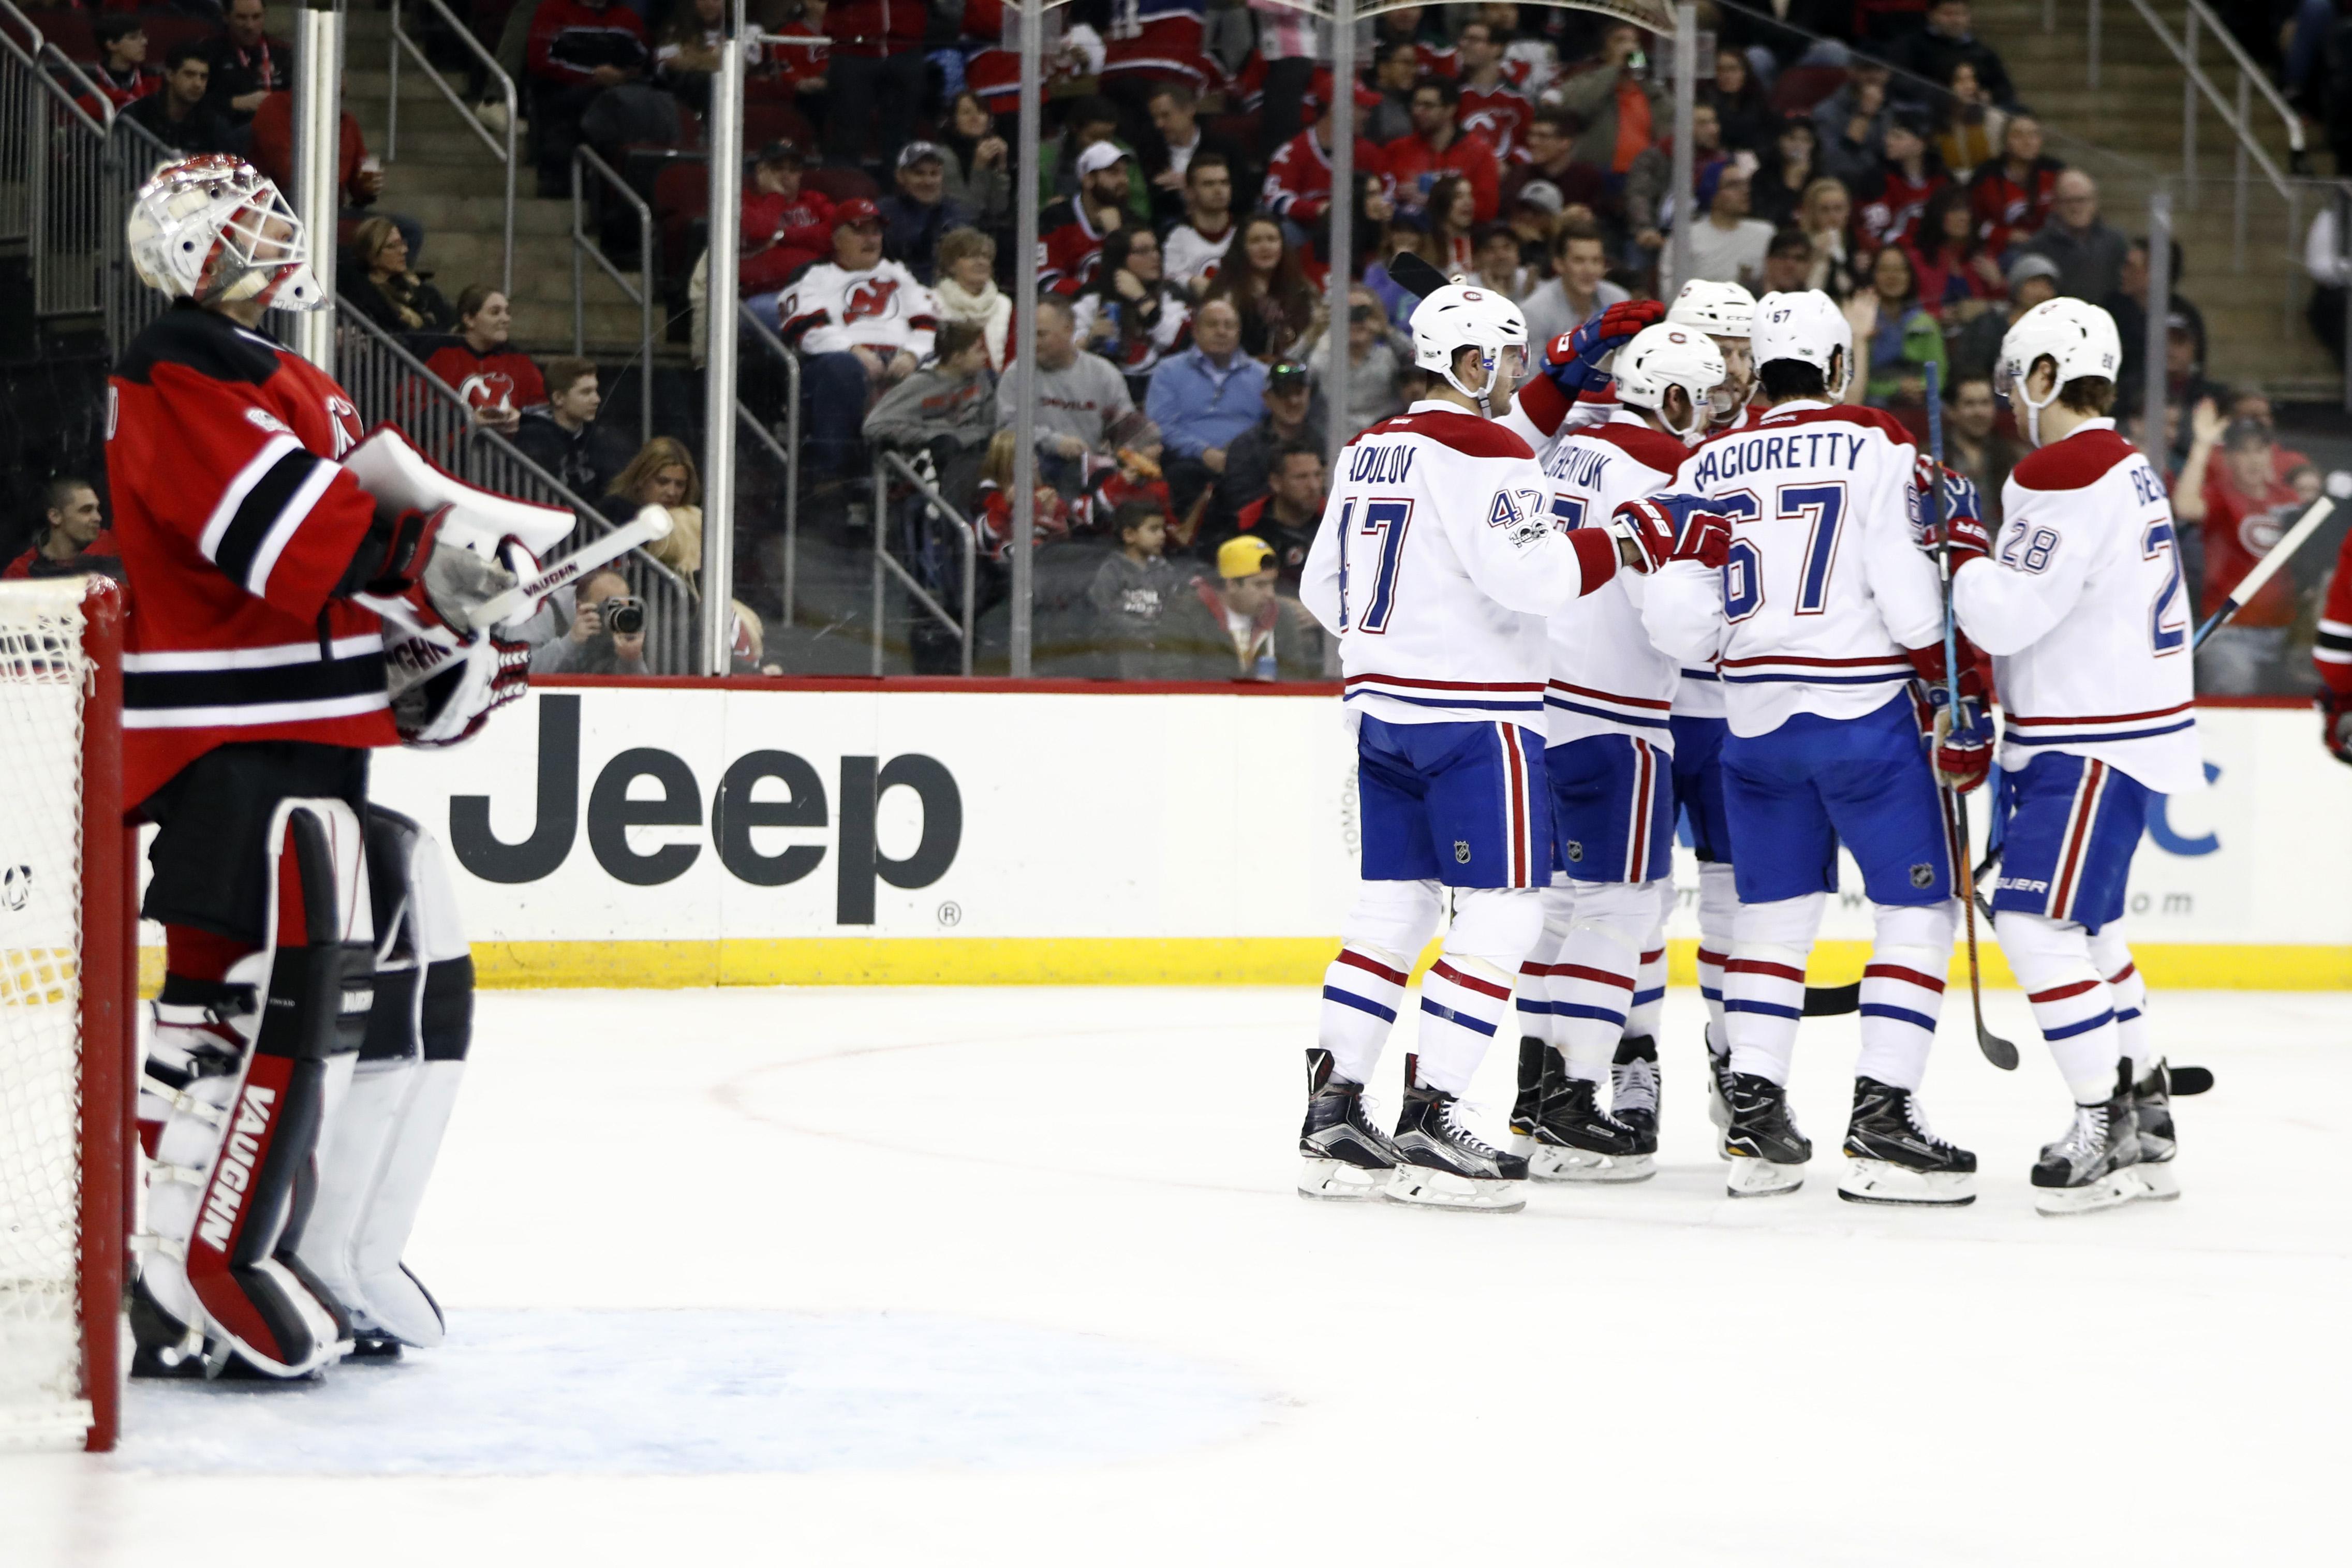 Canadiens_devils_hockey_42409